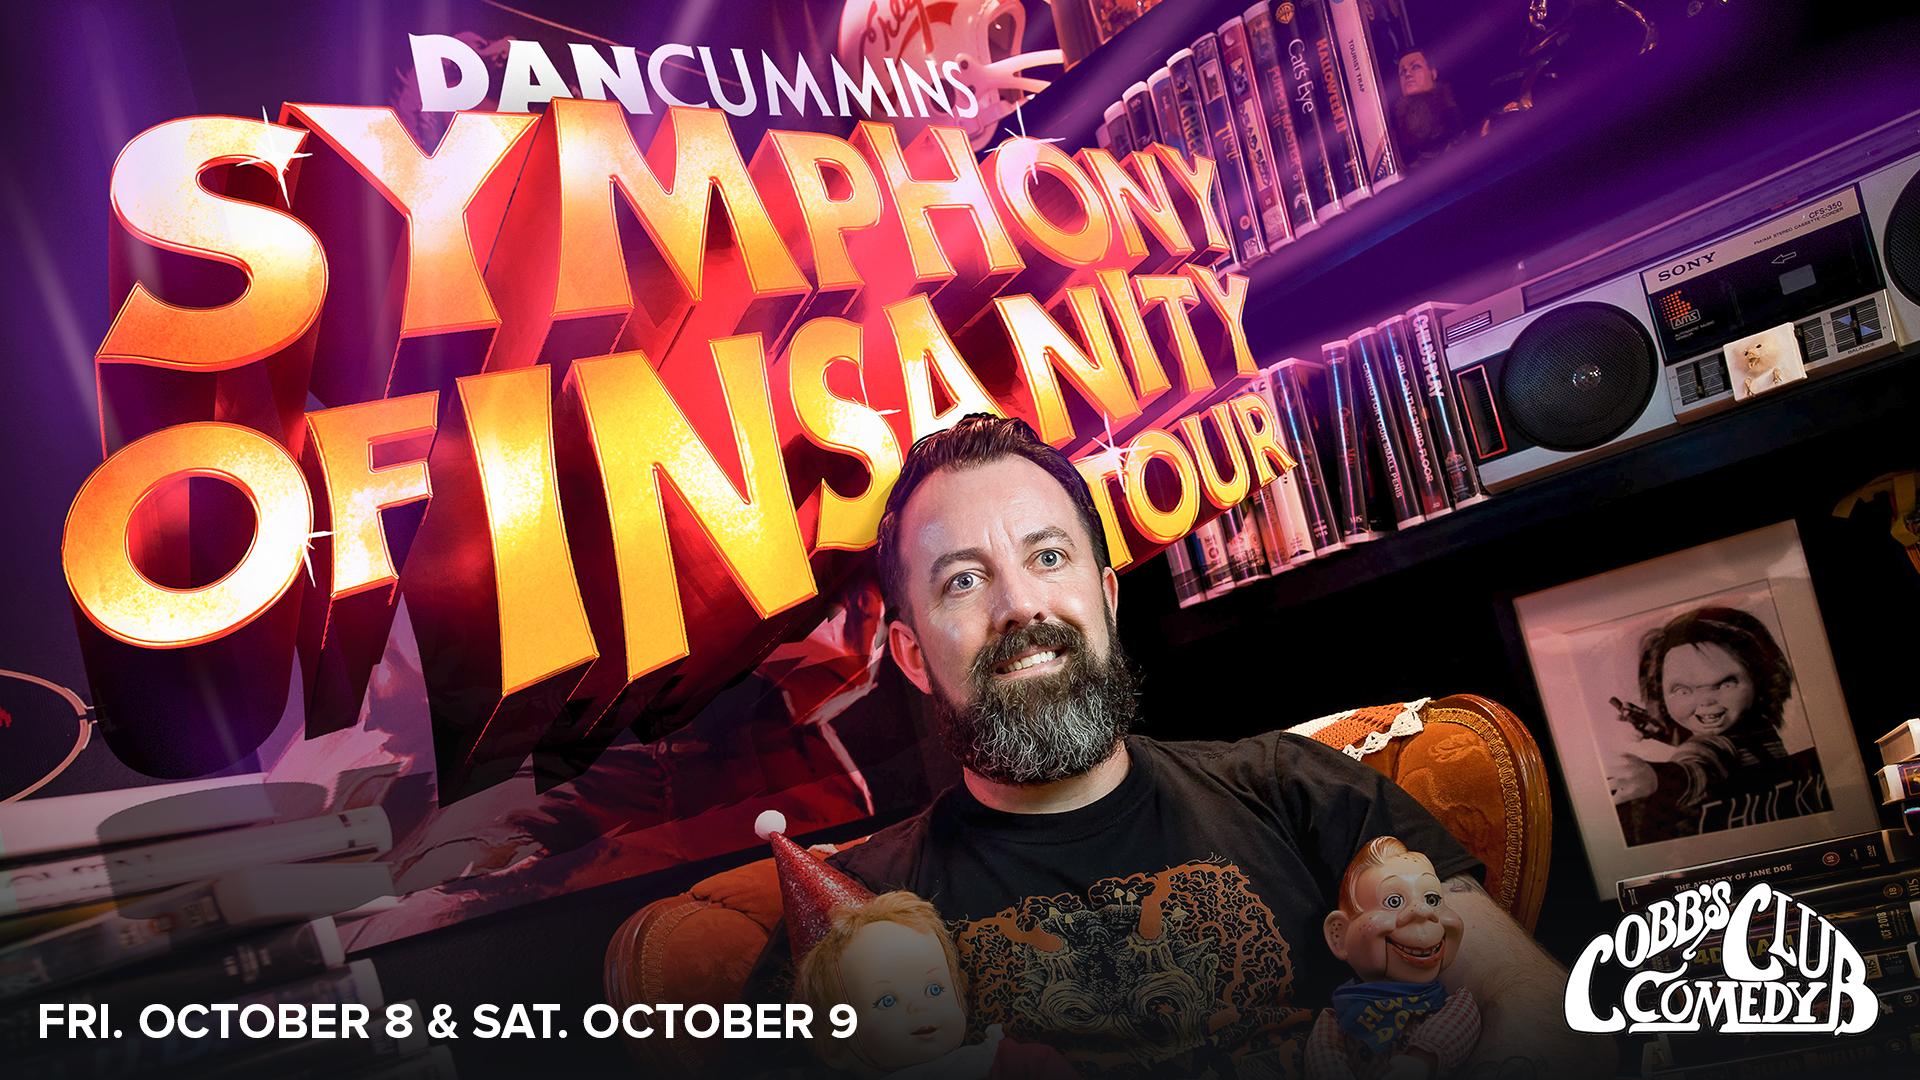 Dan Cummins: Symphony of Insanity Tour